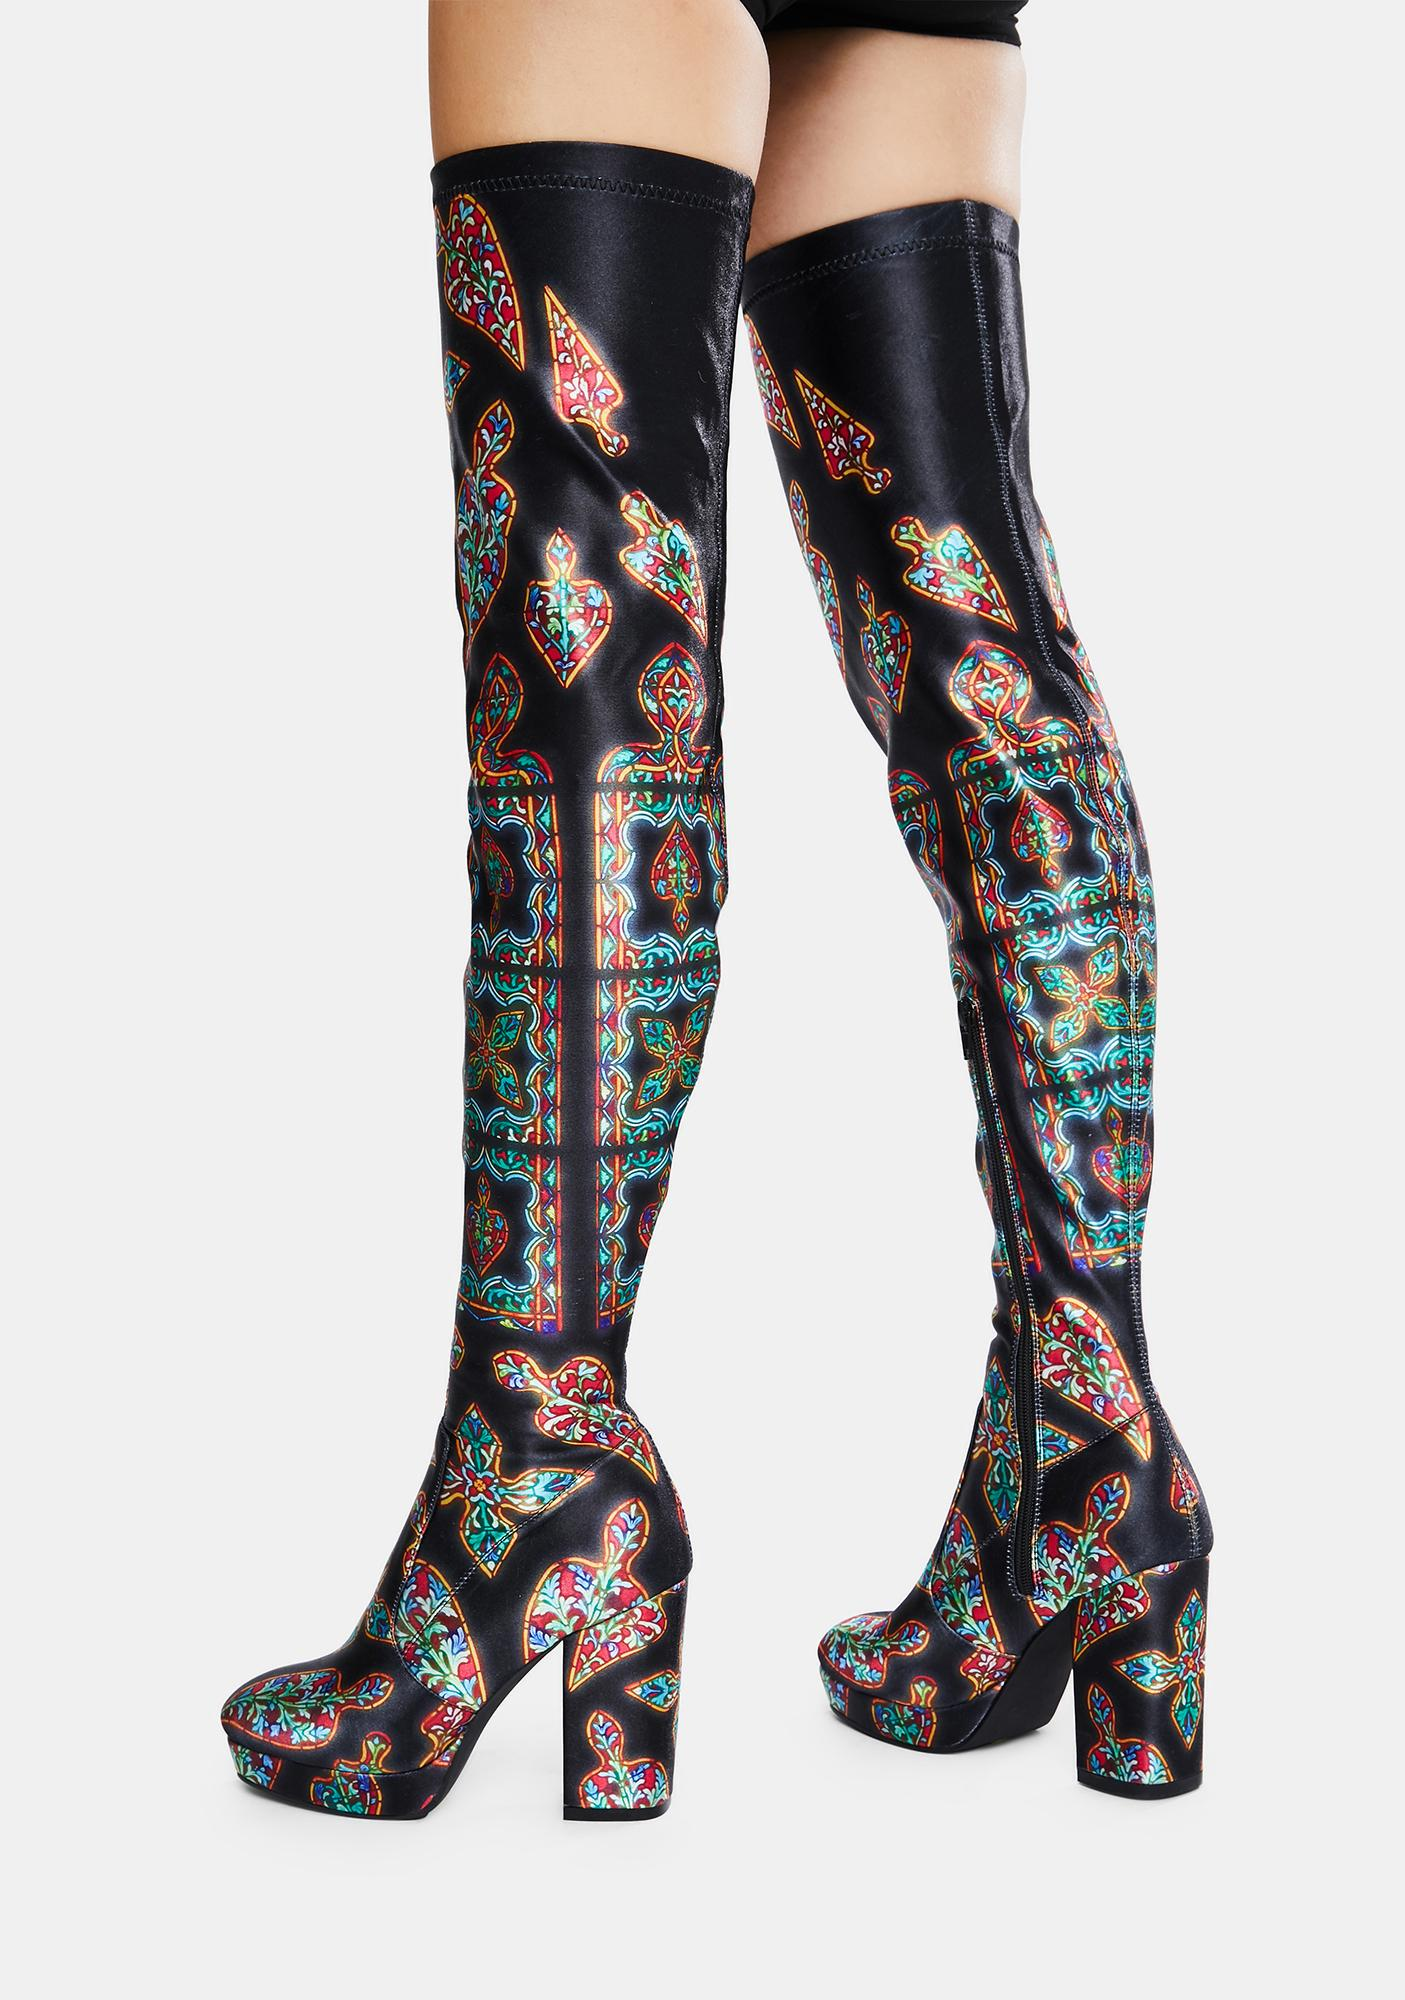 Club Exx Thru The Looking Glass Thigh High Boots